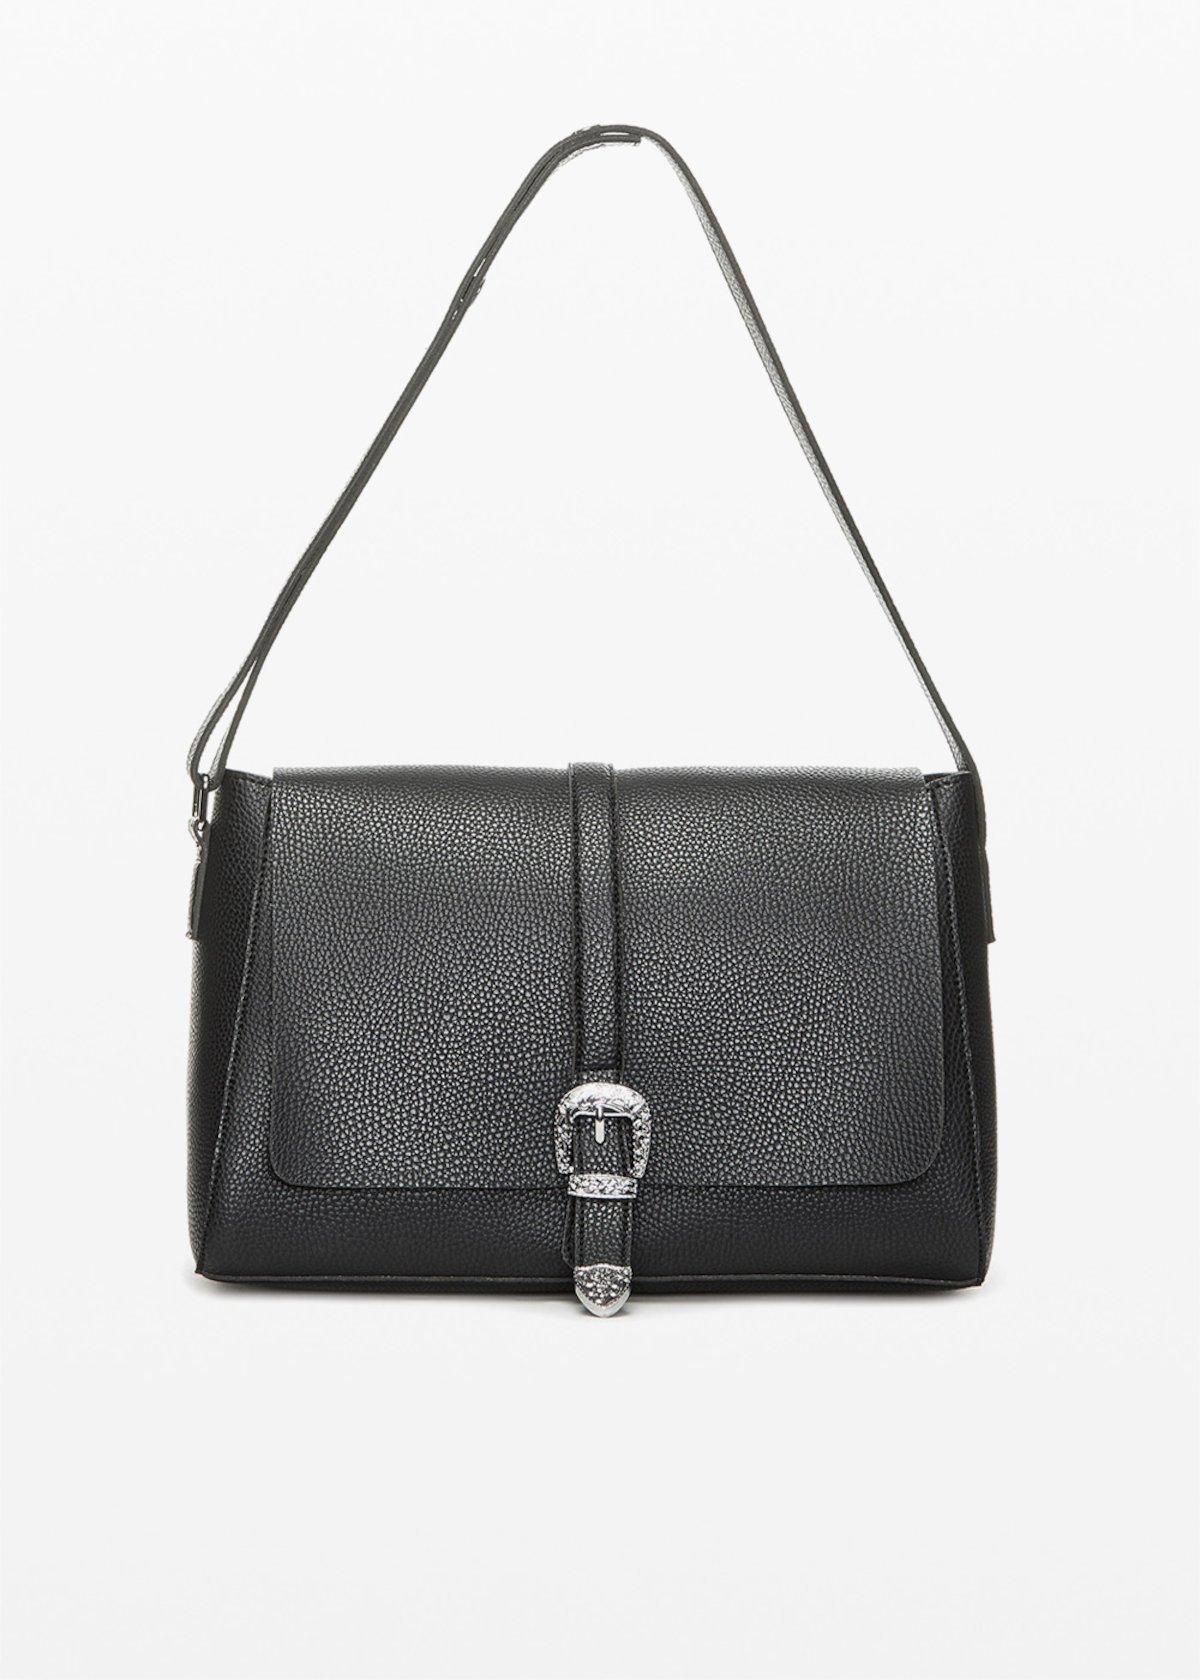 Boraliatx shopping bag with metal closure - Black - Woman - Category image